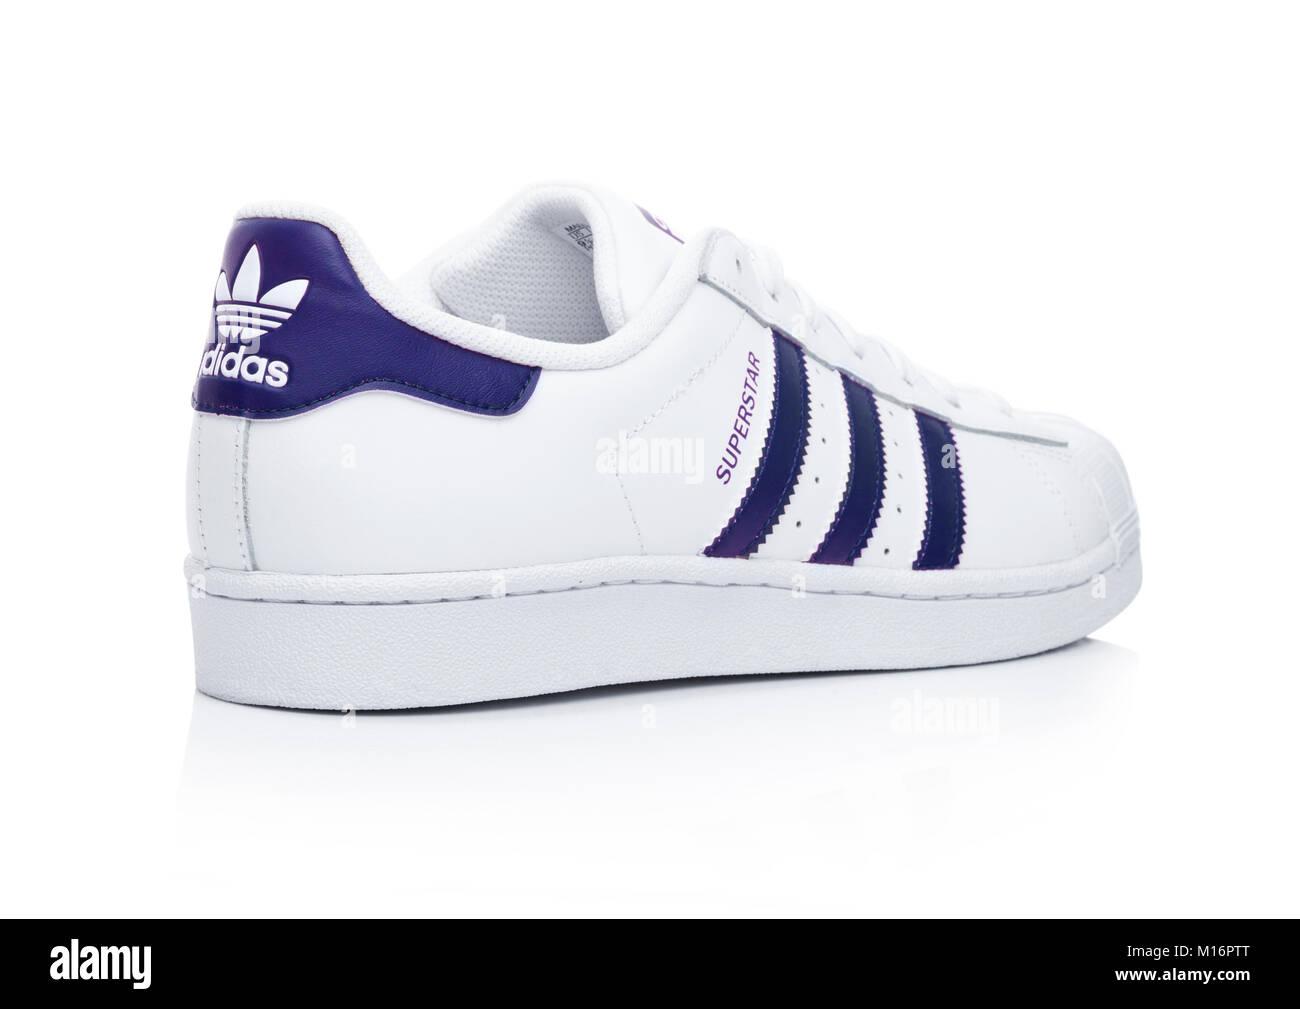 LONDON, UK, 24. JANUAR 2018: Adidas Superstar blau Schuhe